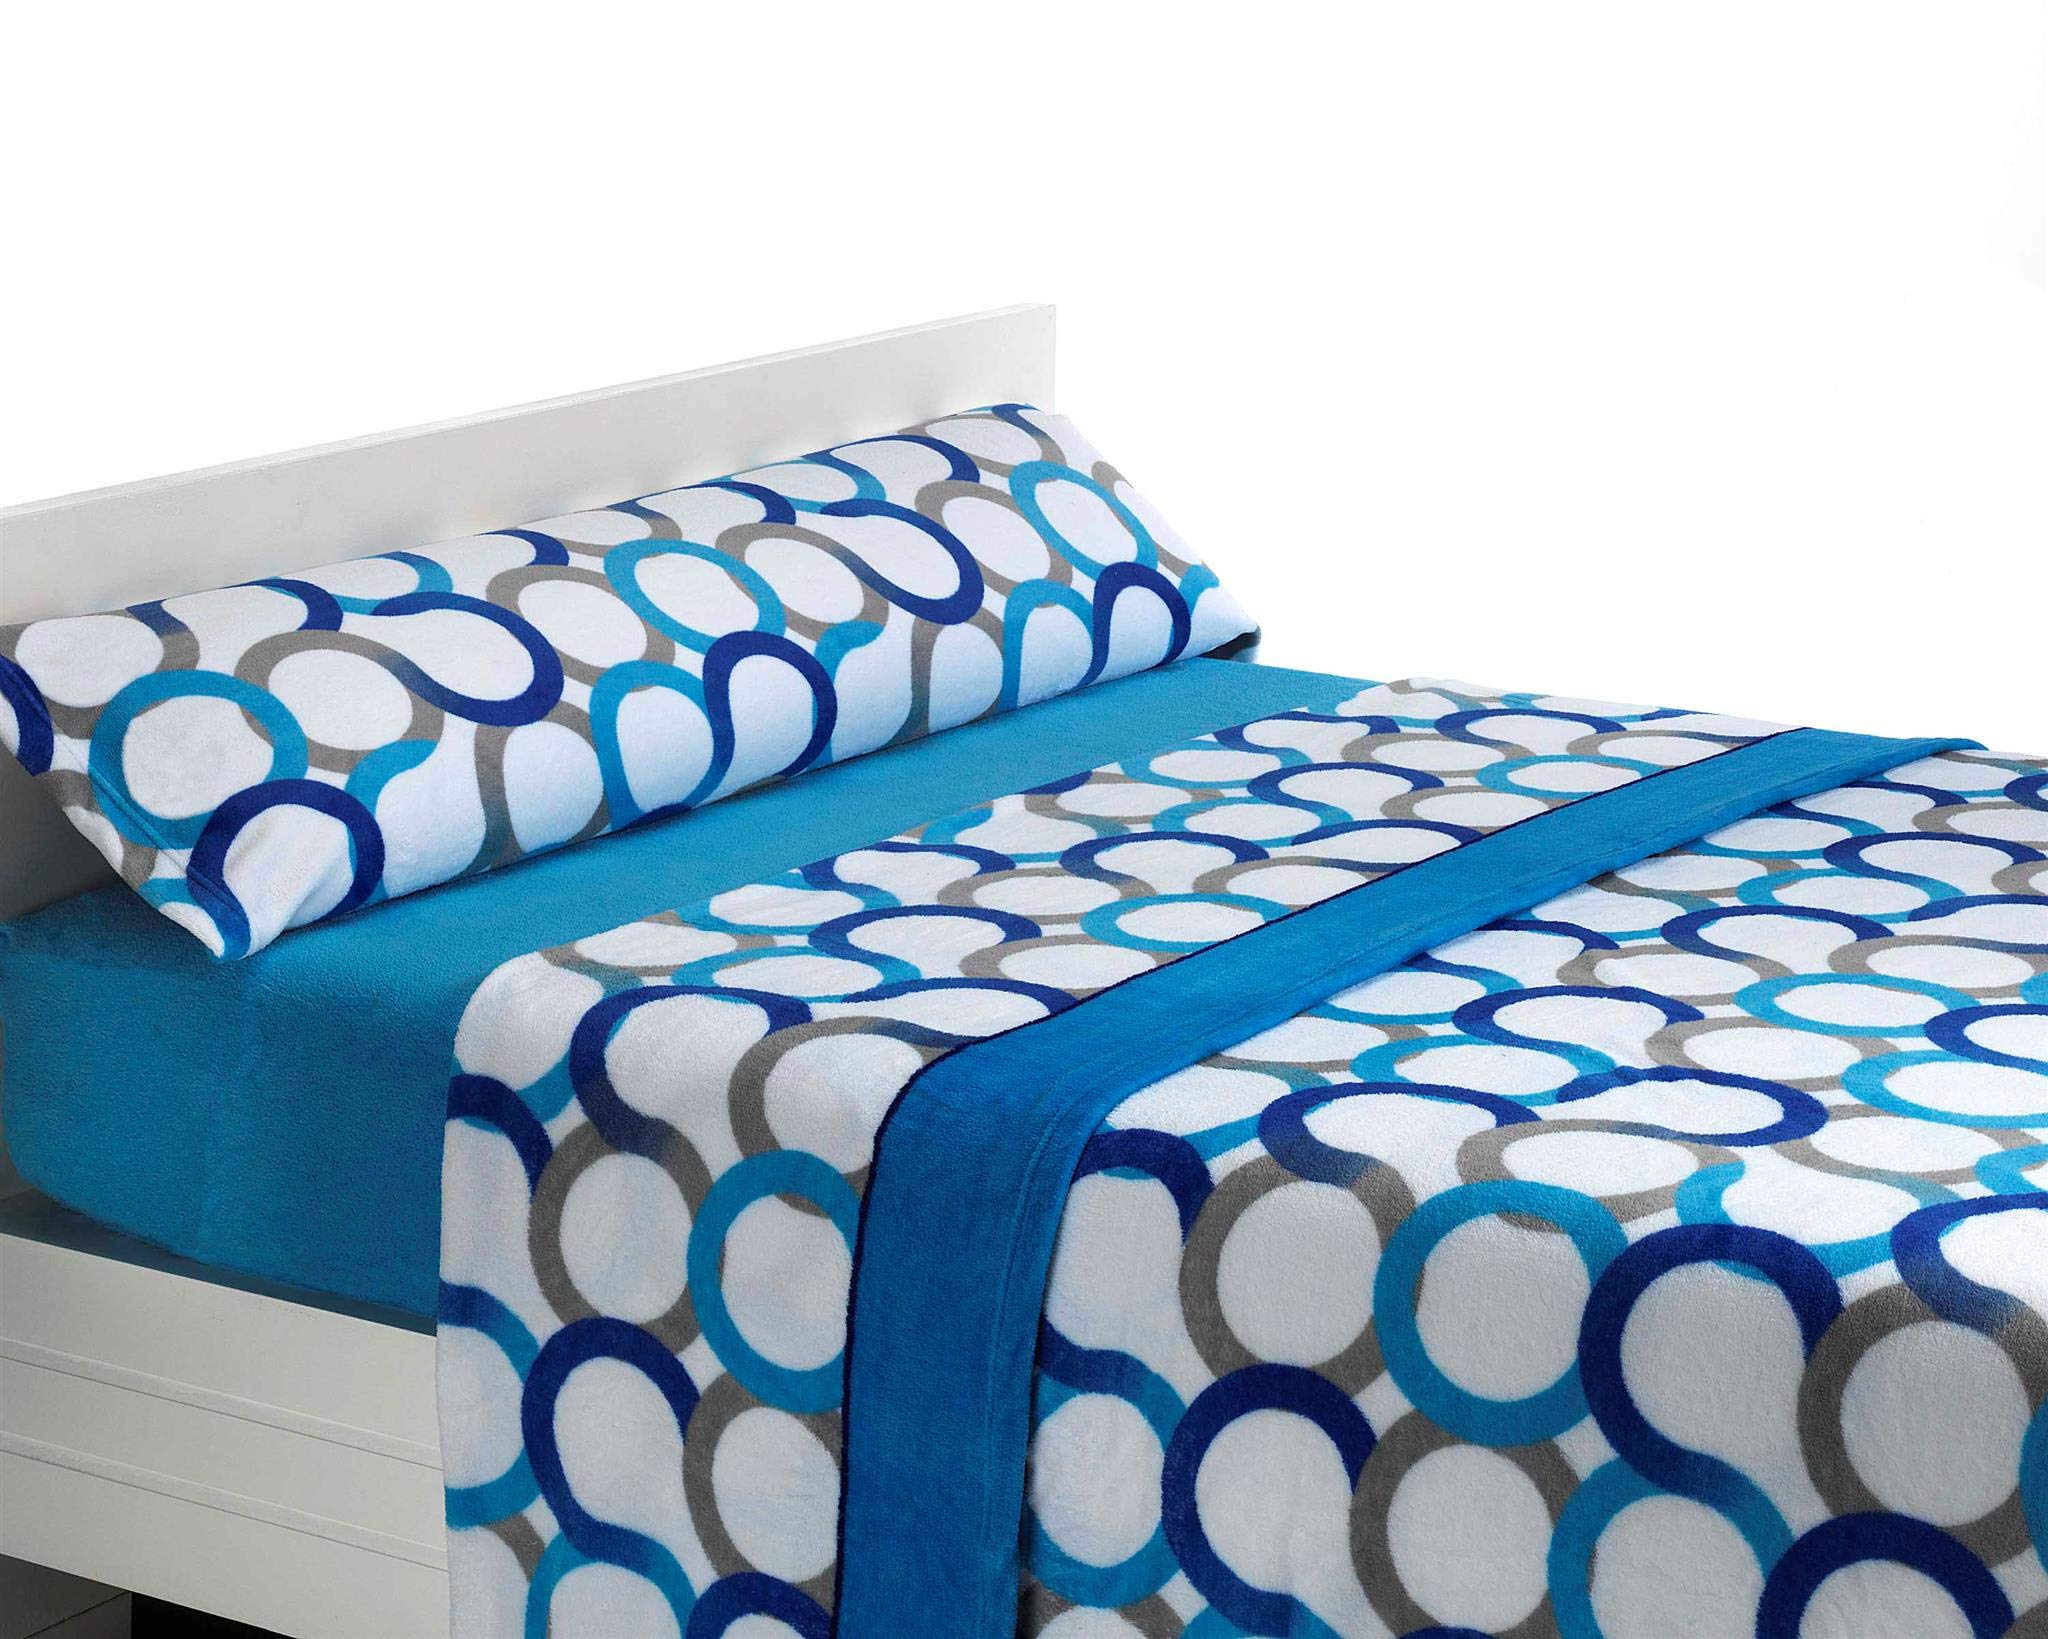 SABANALIA Juego de sábanas de coralina Aros - Cama 135, Azul: Amazon.es: Hogar